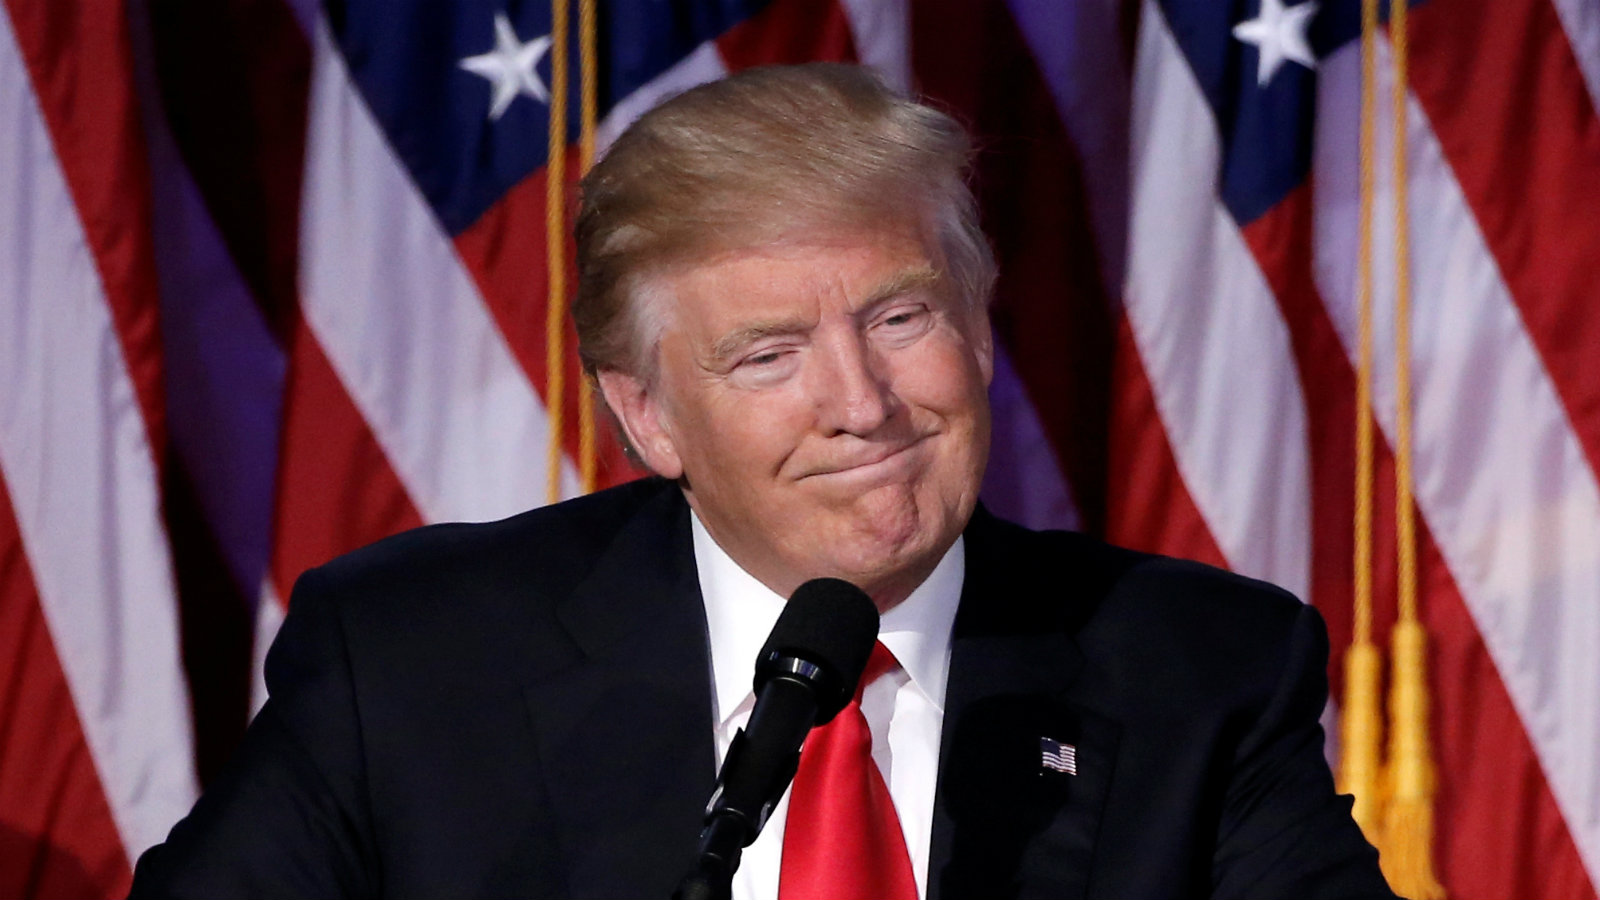 U.S. President-elect Donald Trump speaks at election night rally in Manhattan, New York, U.S., November 9, 2016.